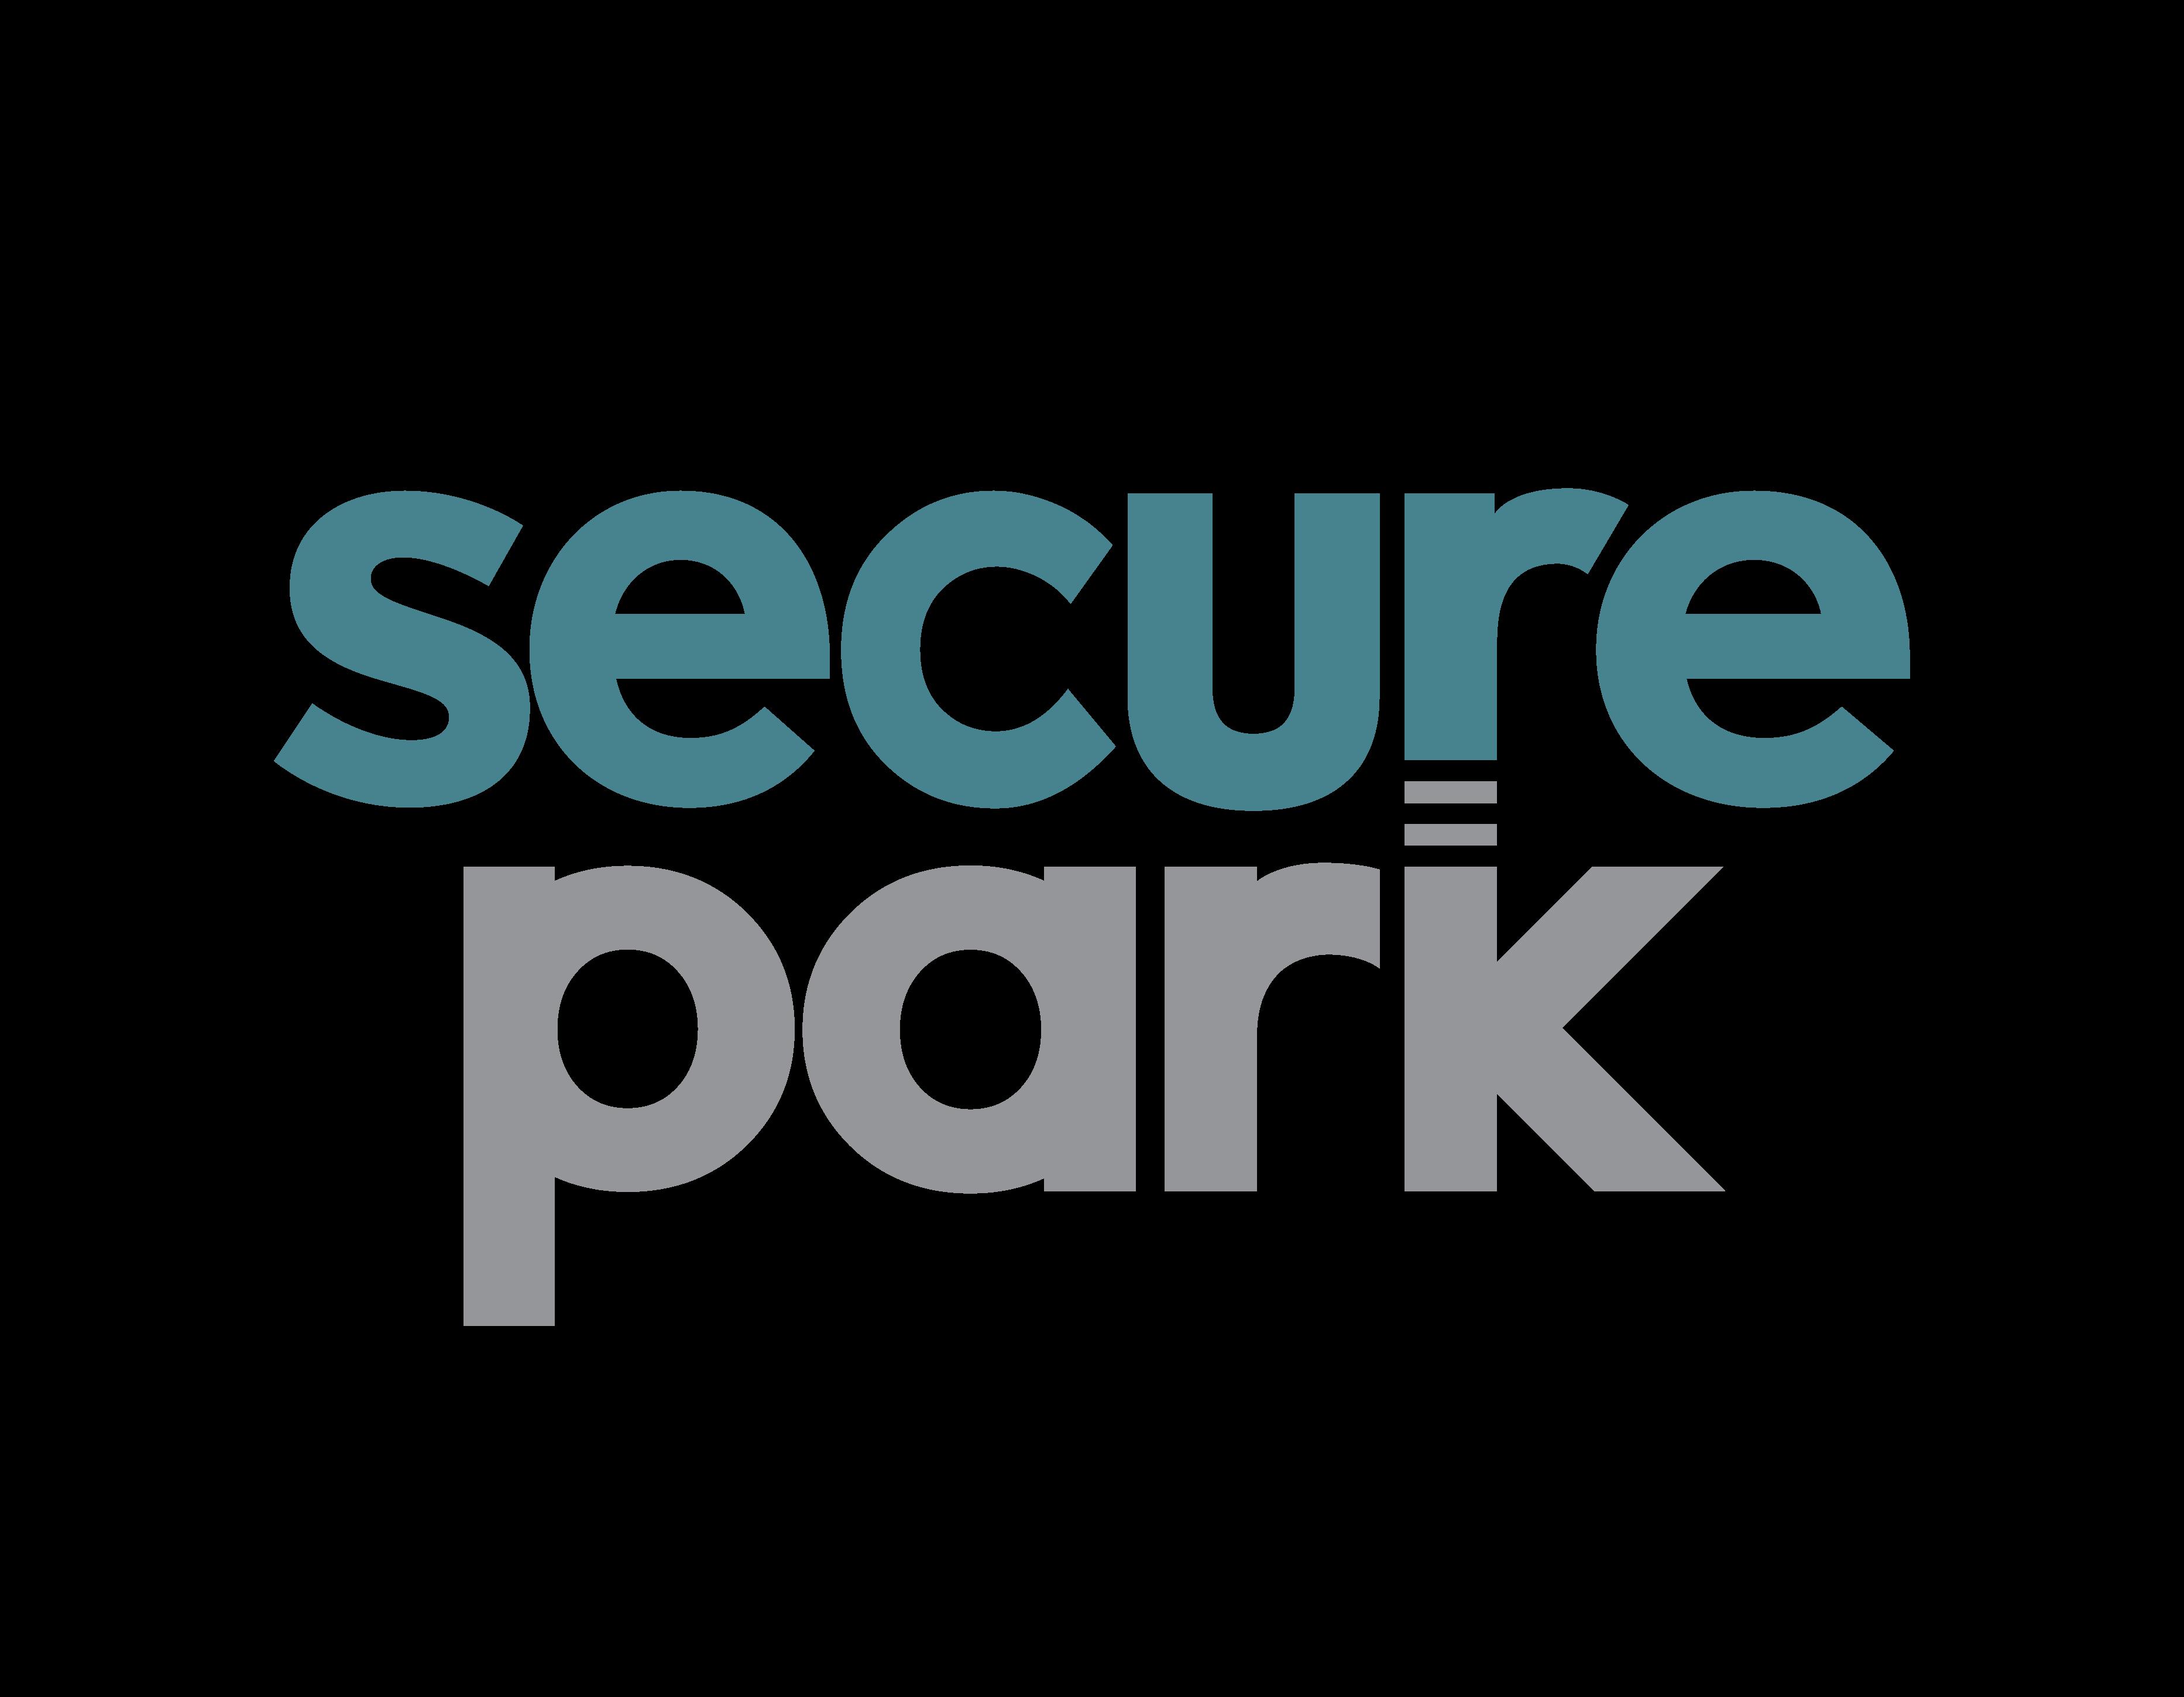 SecurePark logo